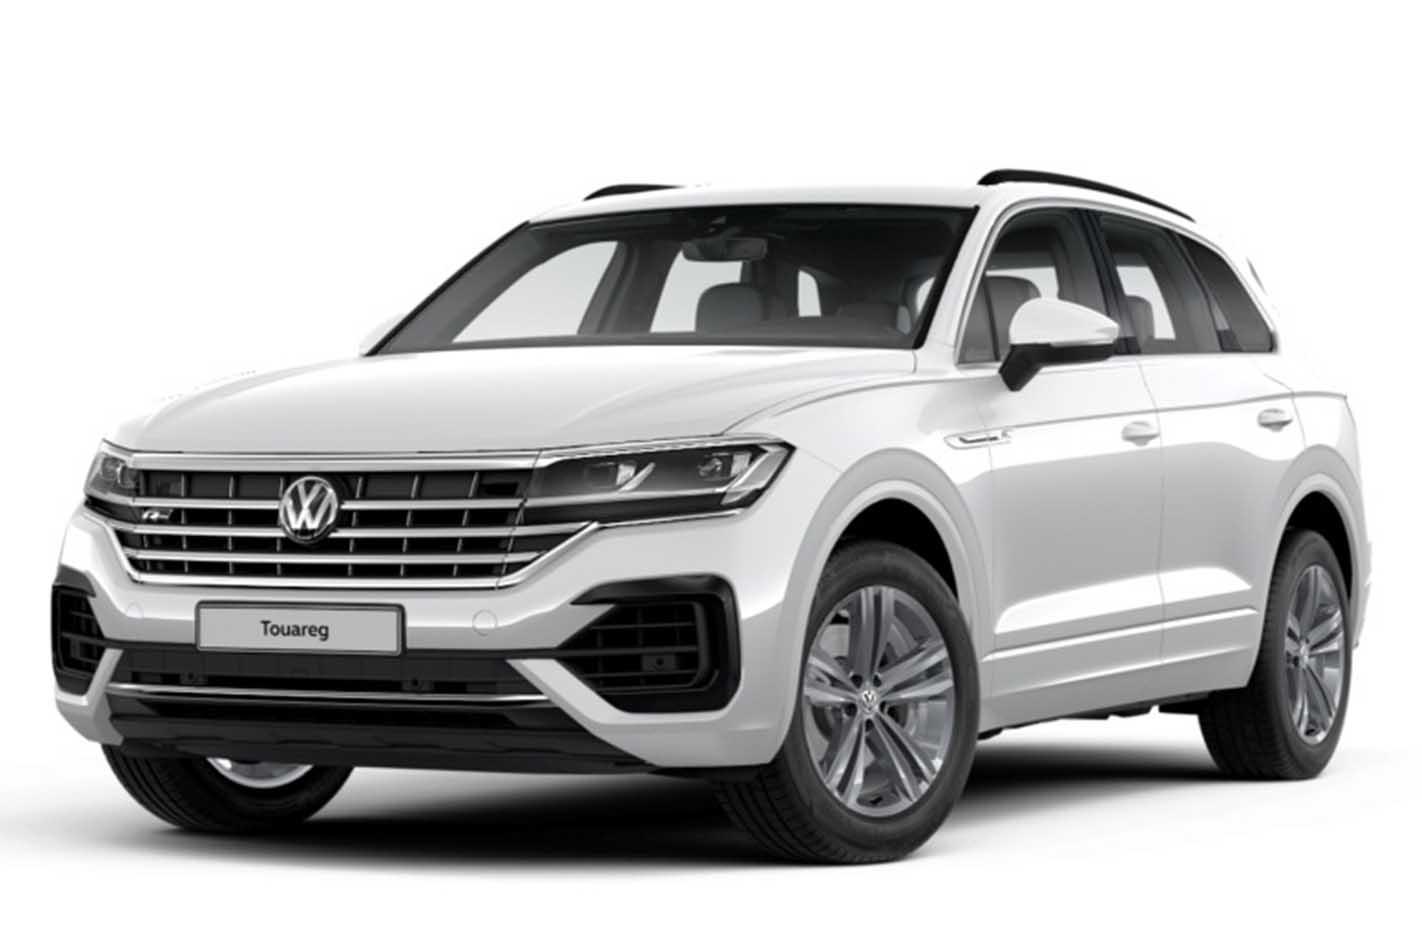 05. Volkswagen Touareg